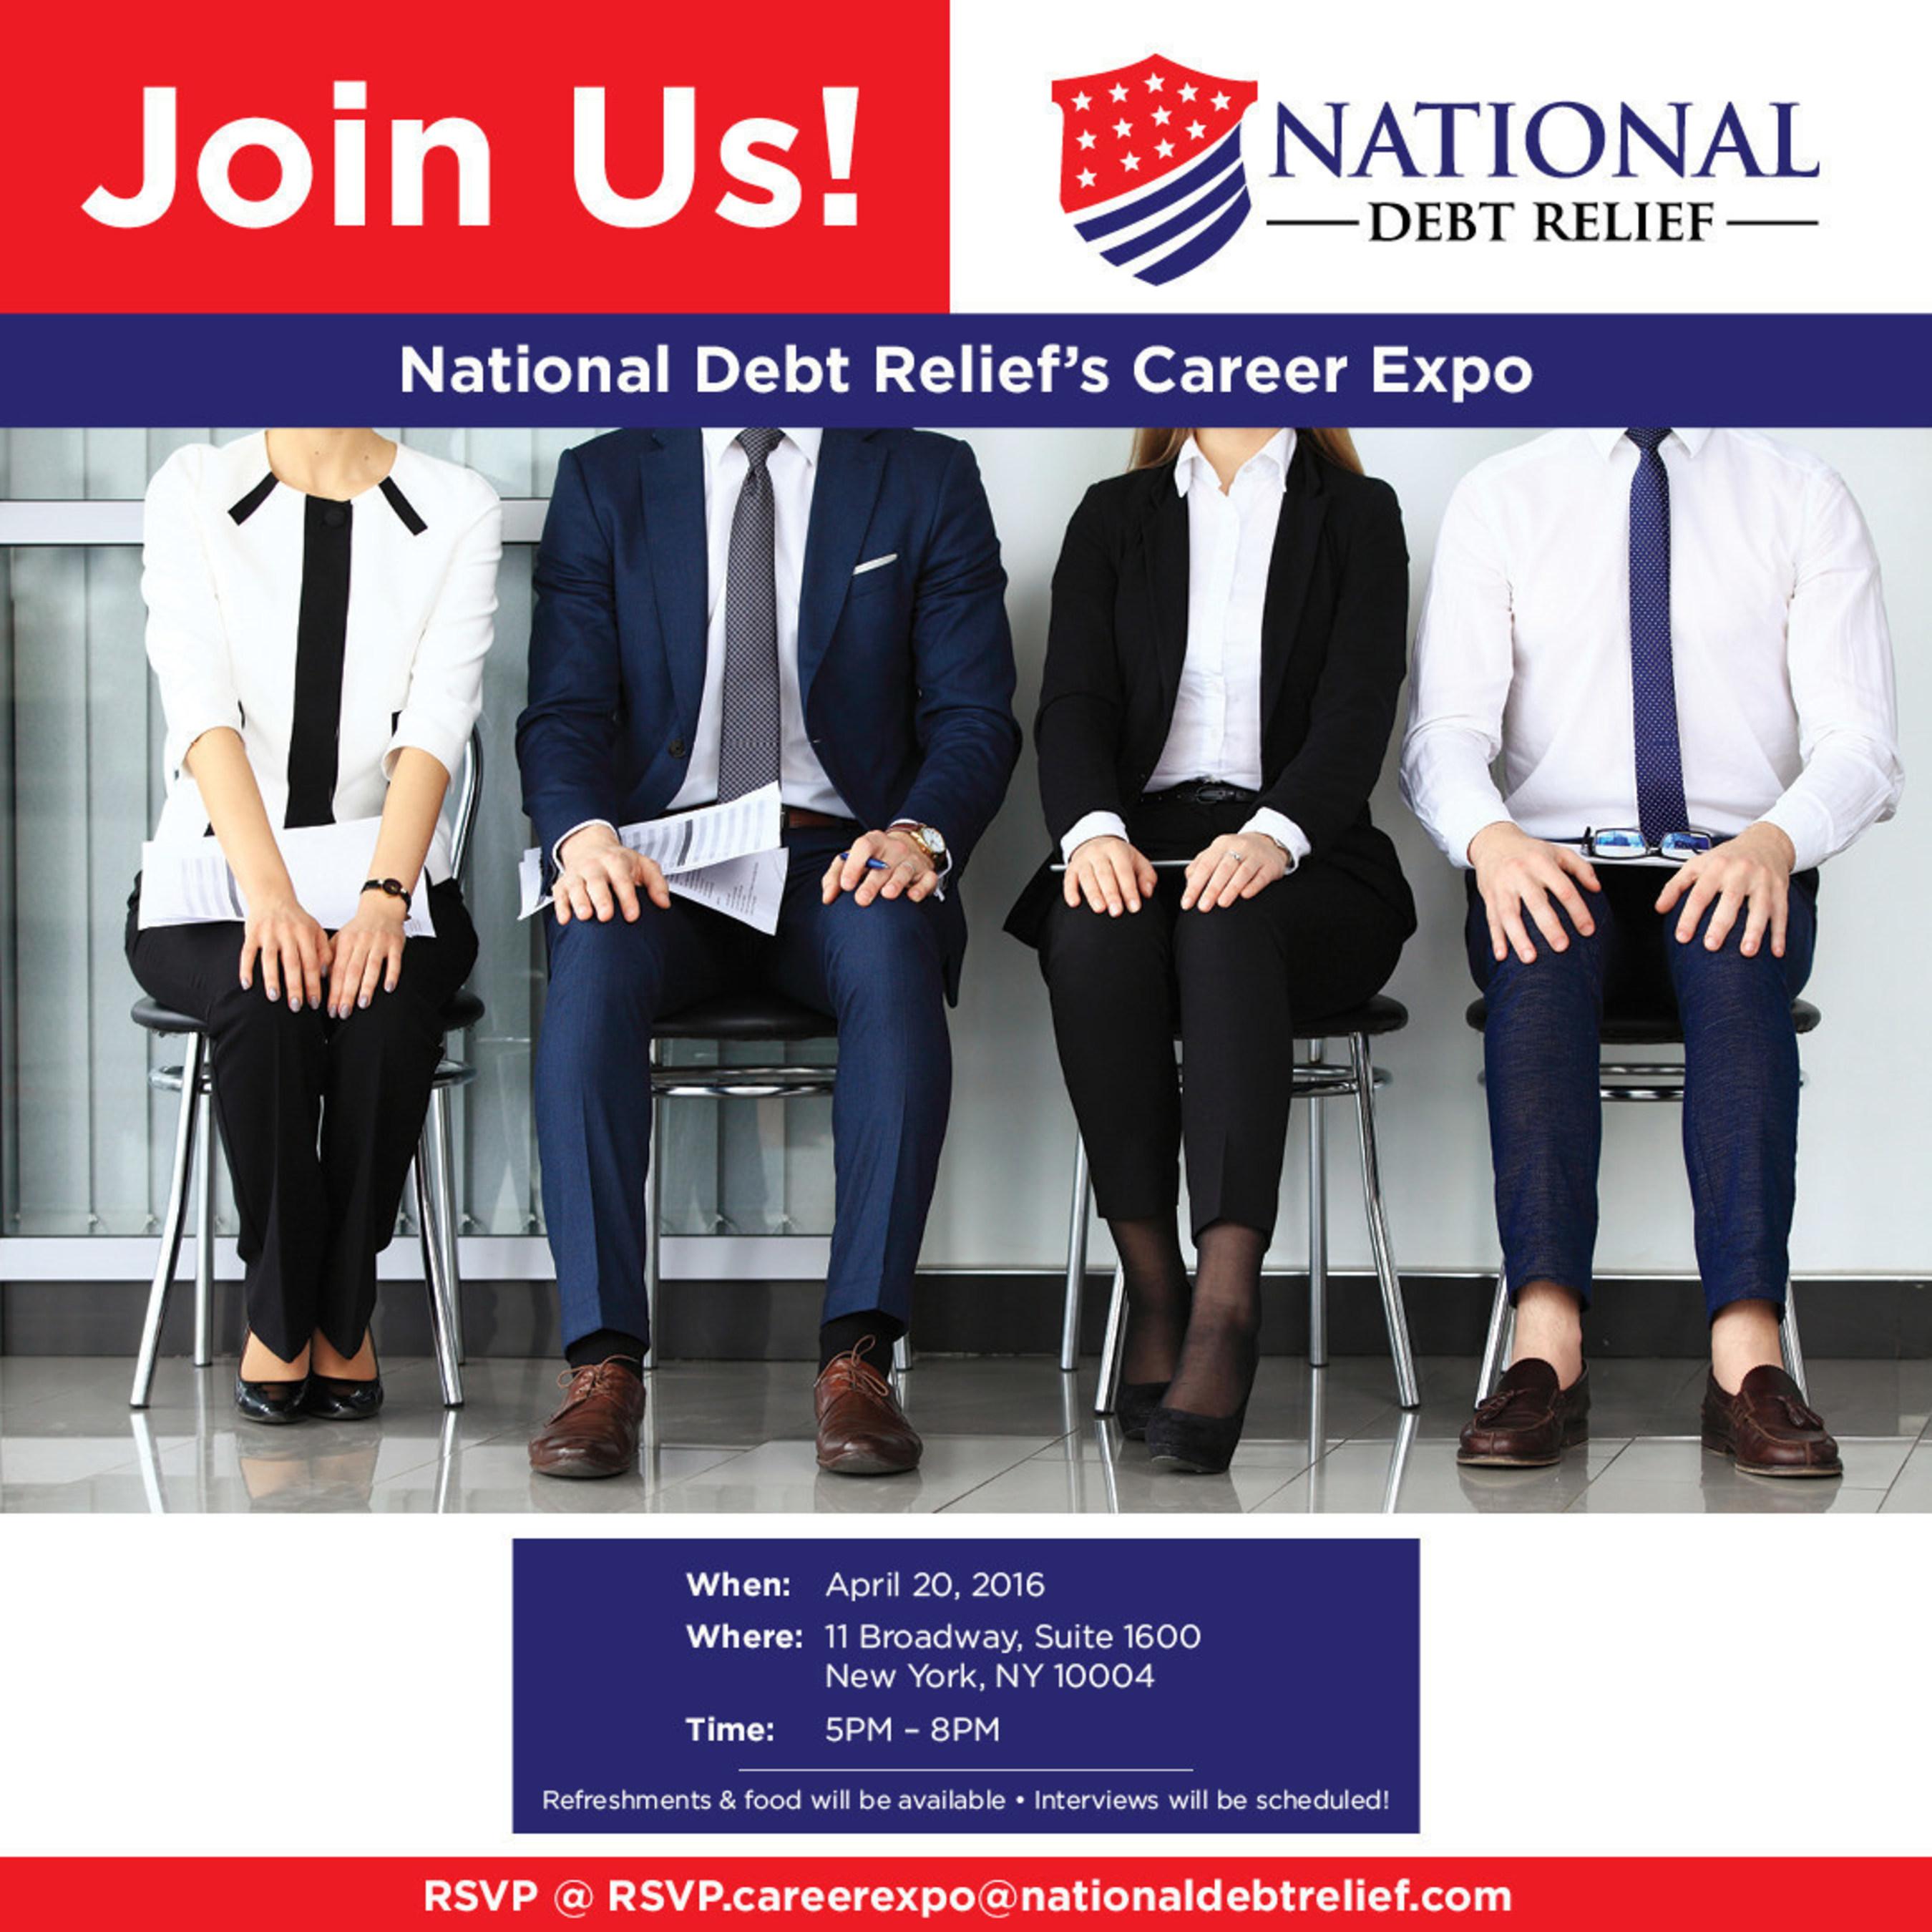 New York City Job Fair With National Debt Relief